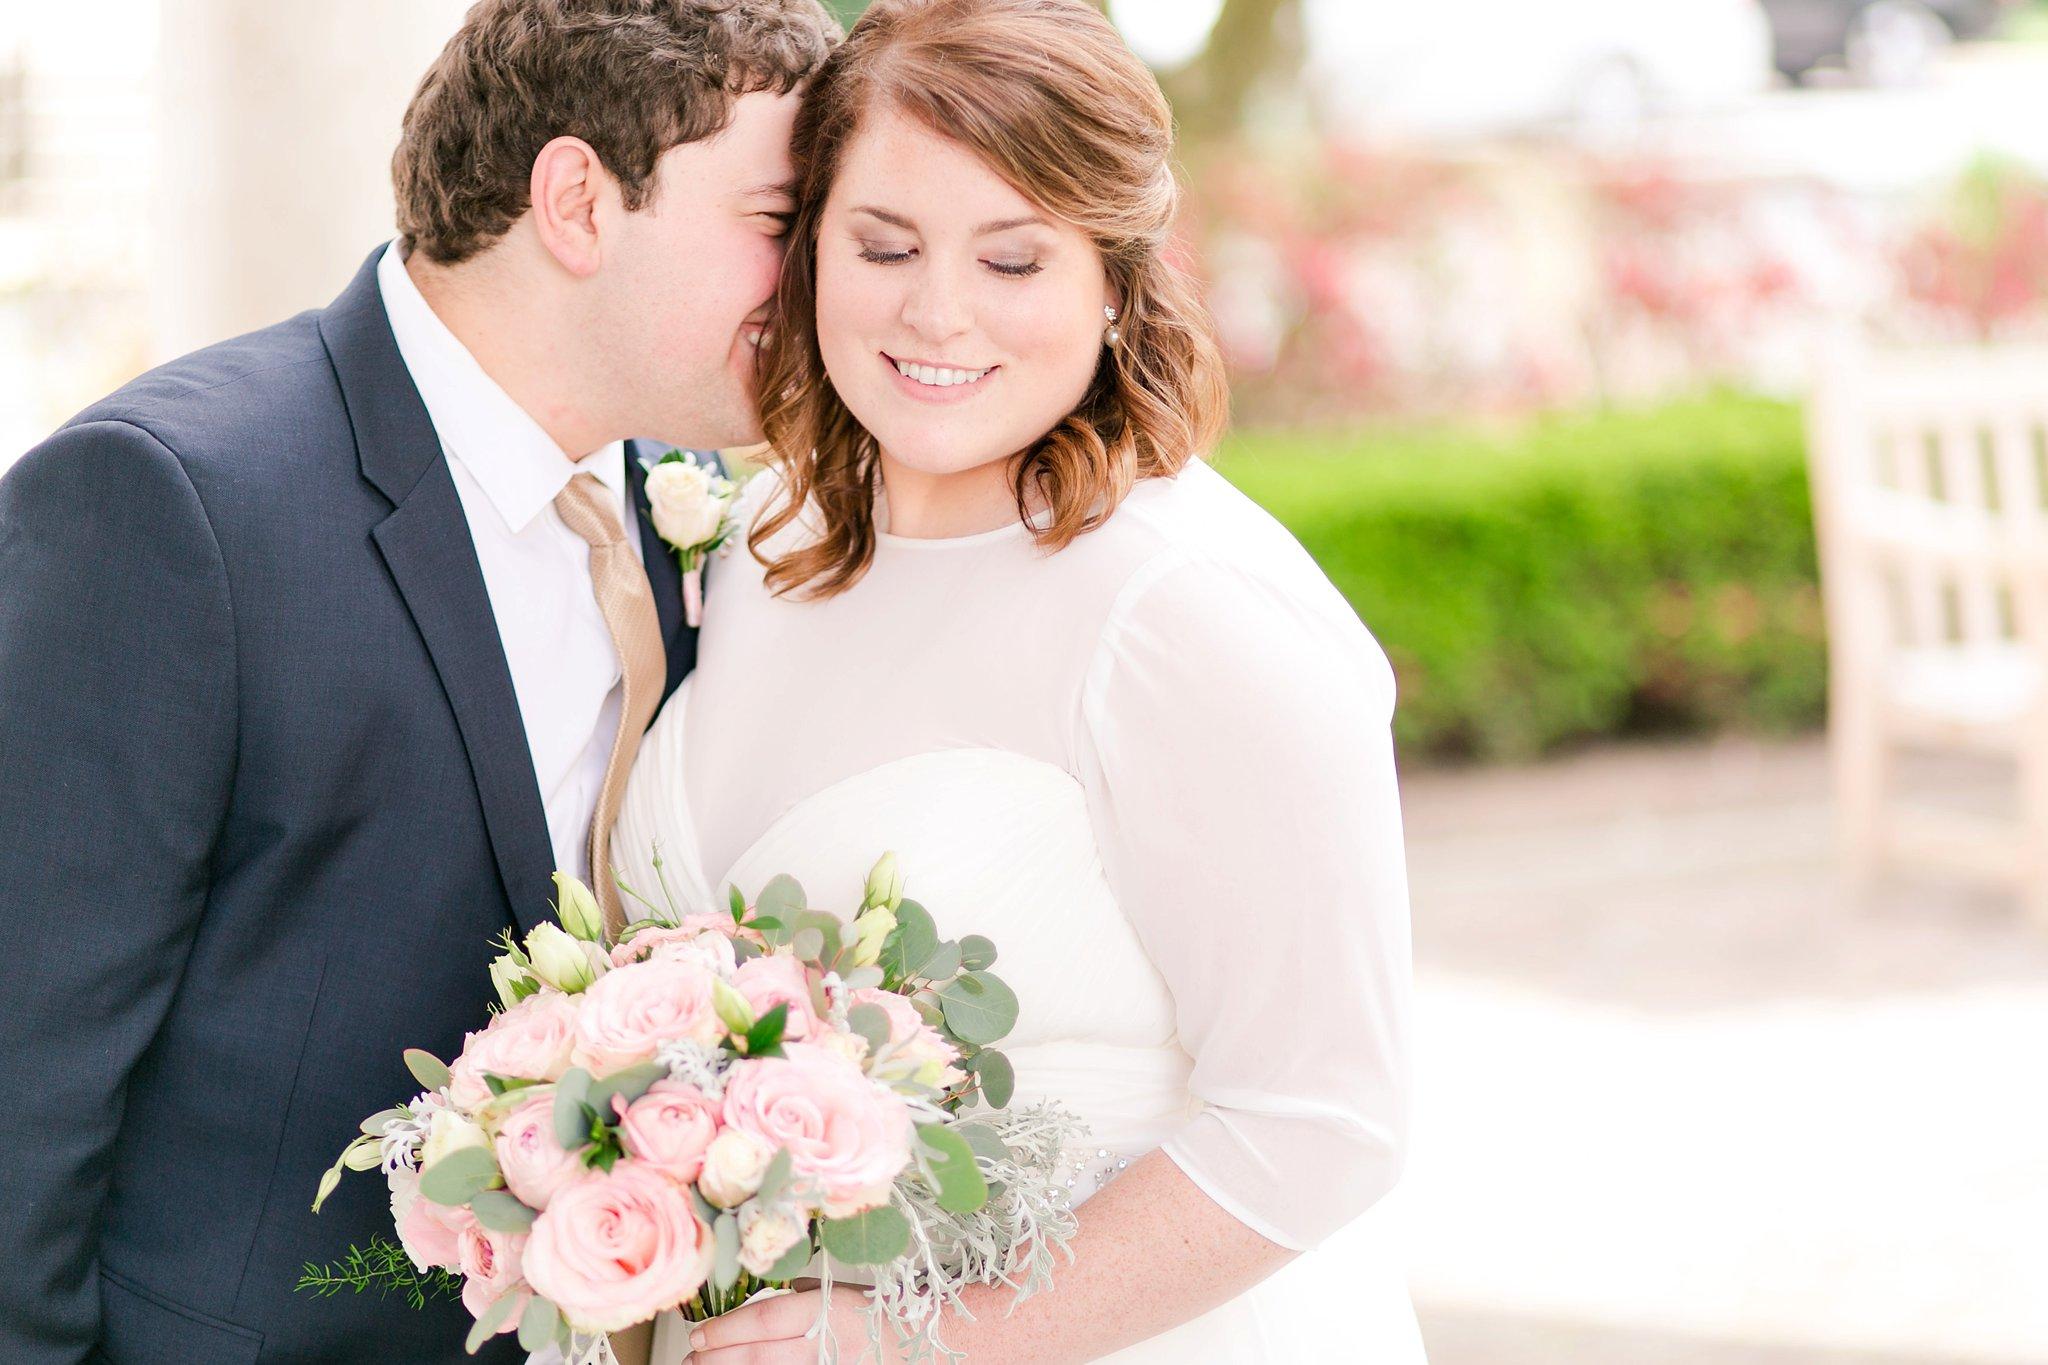 Congressional Country Club Wedding Photos DC Maryland Wedding Photographer Megan Kelsey Photography Kelly & Andrew-92.jpg